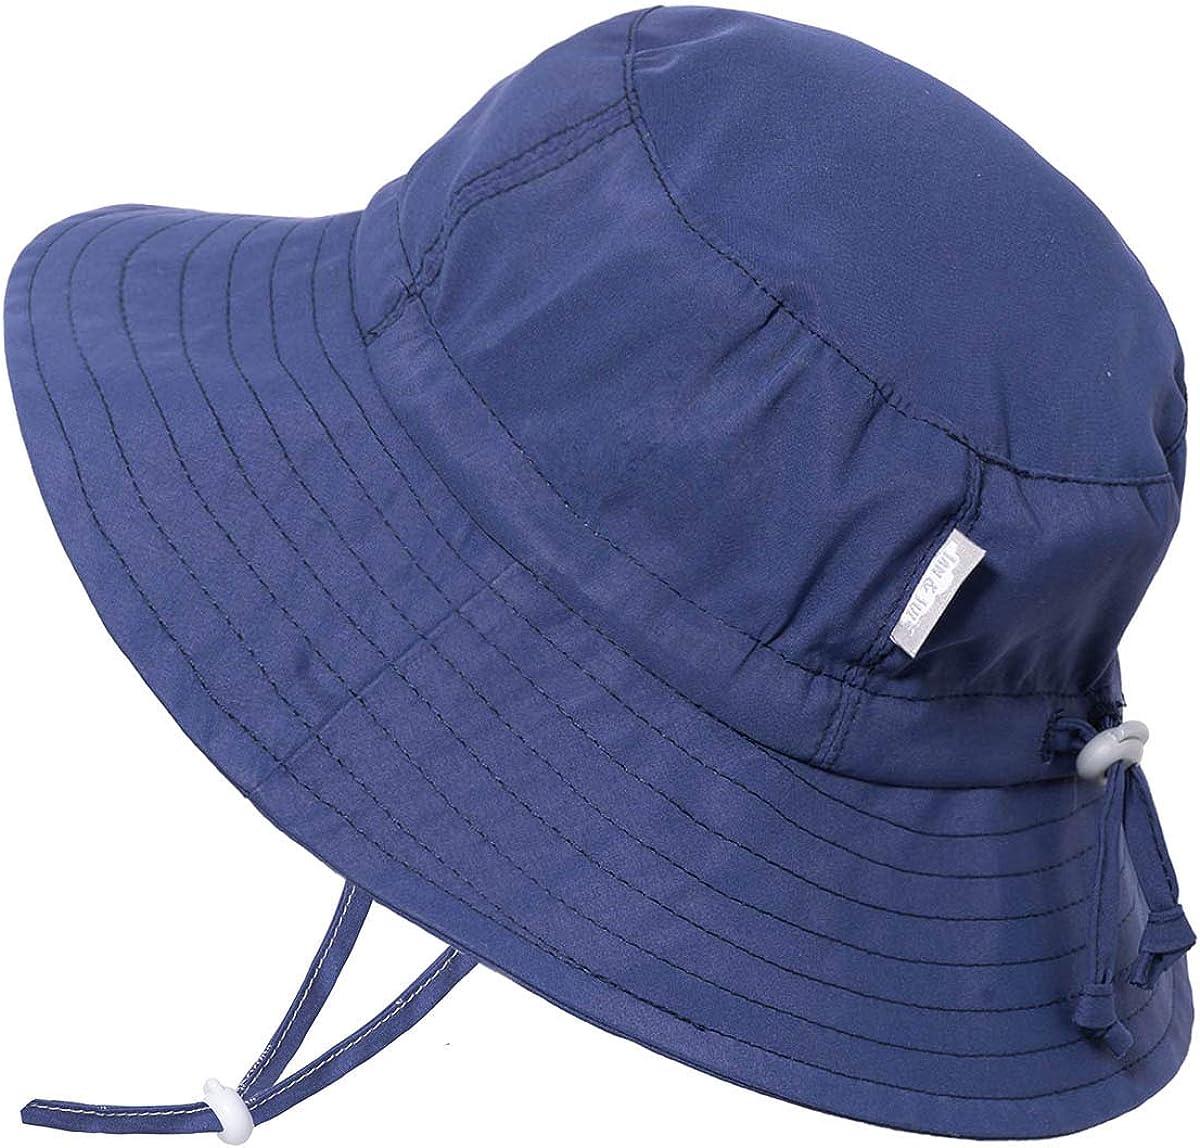 JAN /& JUL Kids Aqua-Dry Sun-Hat Girl or Boy for Baby and Toddler 50+UPF Adjustable Straps